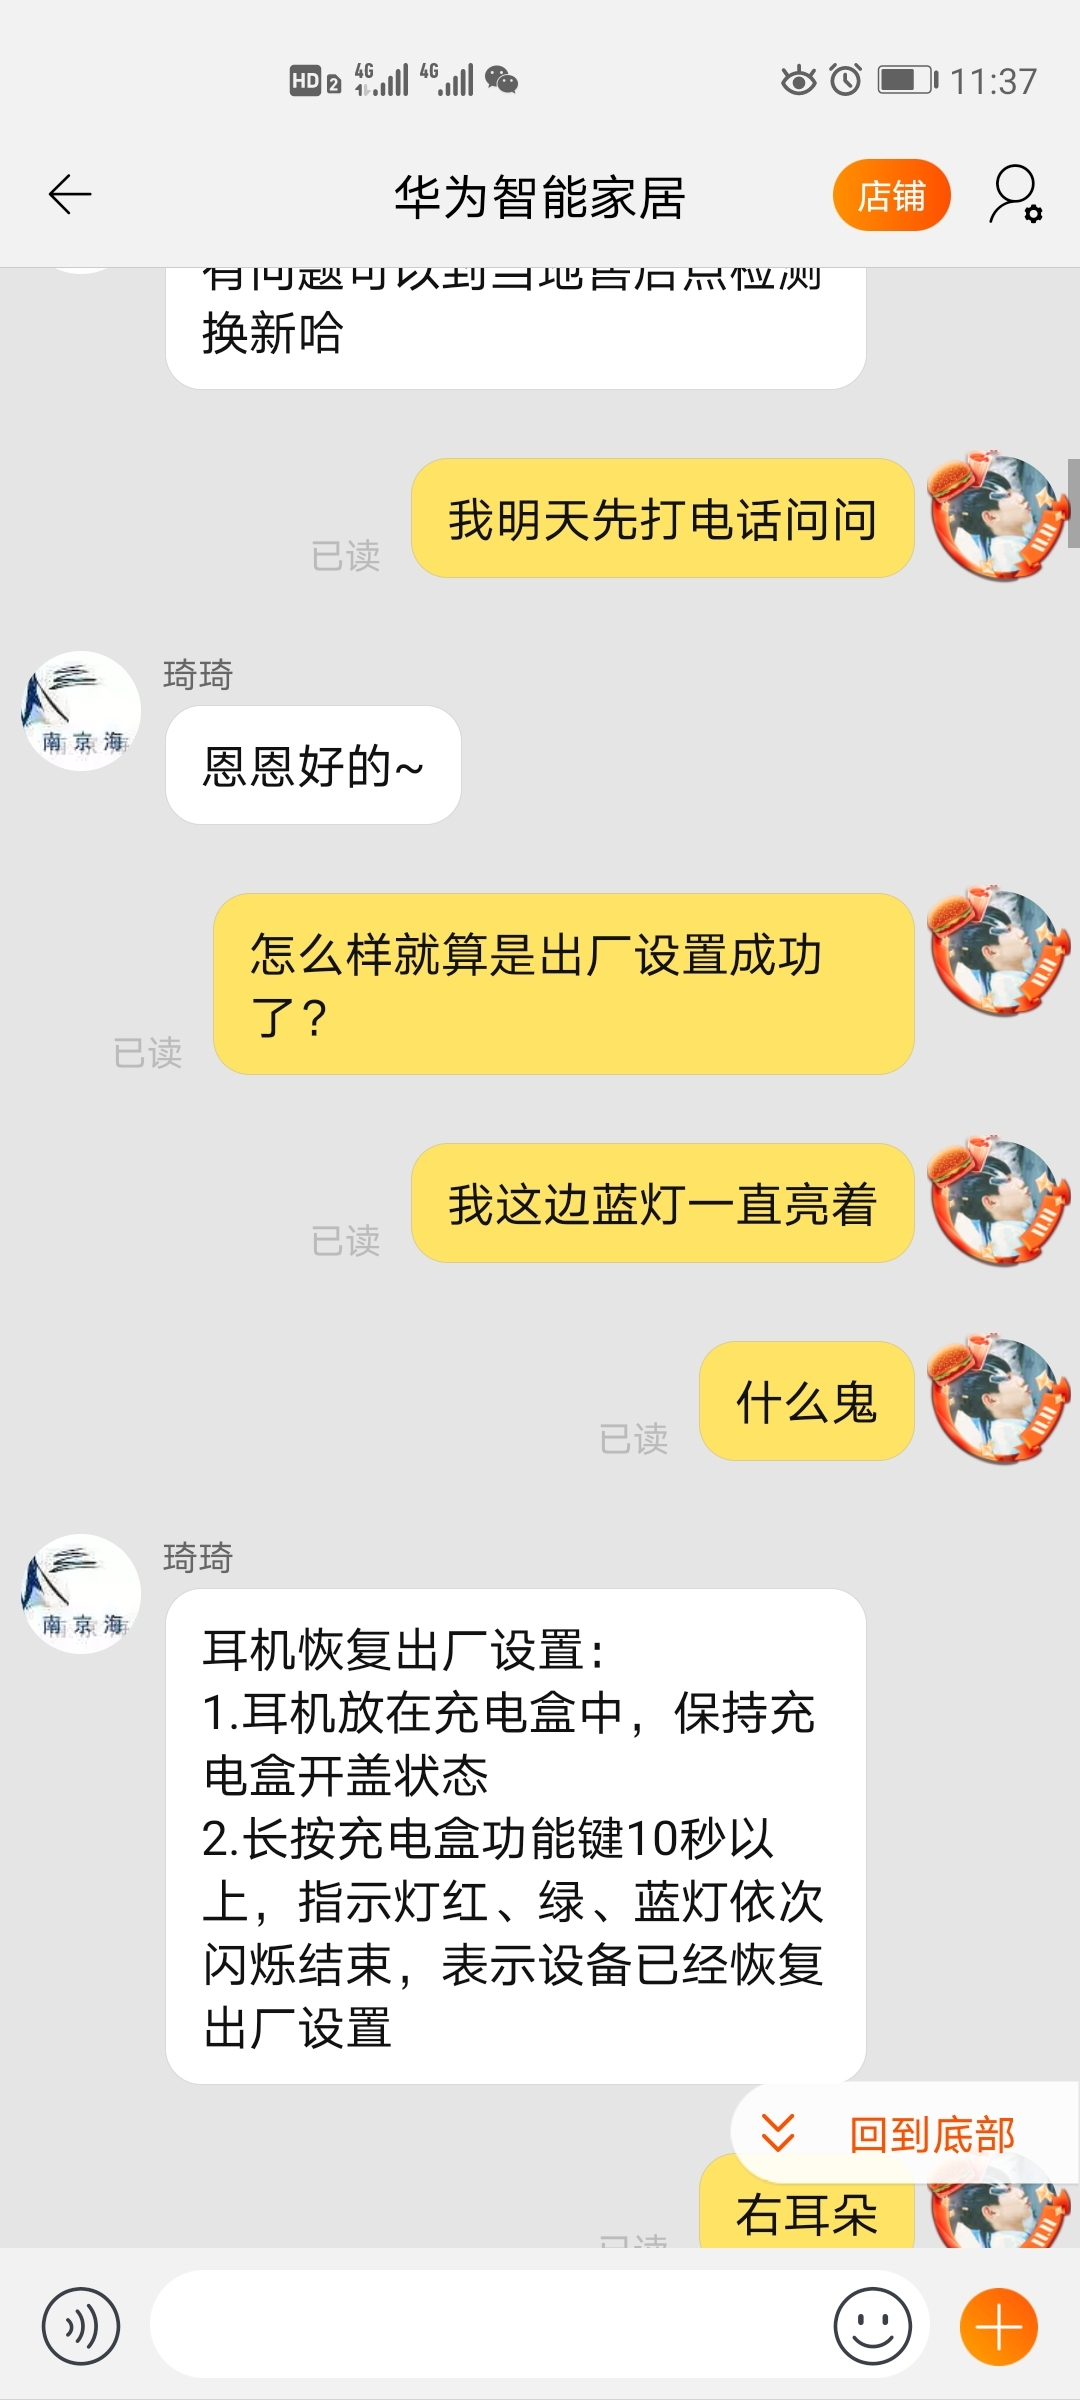 Screenshot_20200508_113717_com.taobao.taobao.jpg